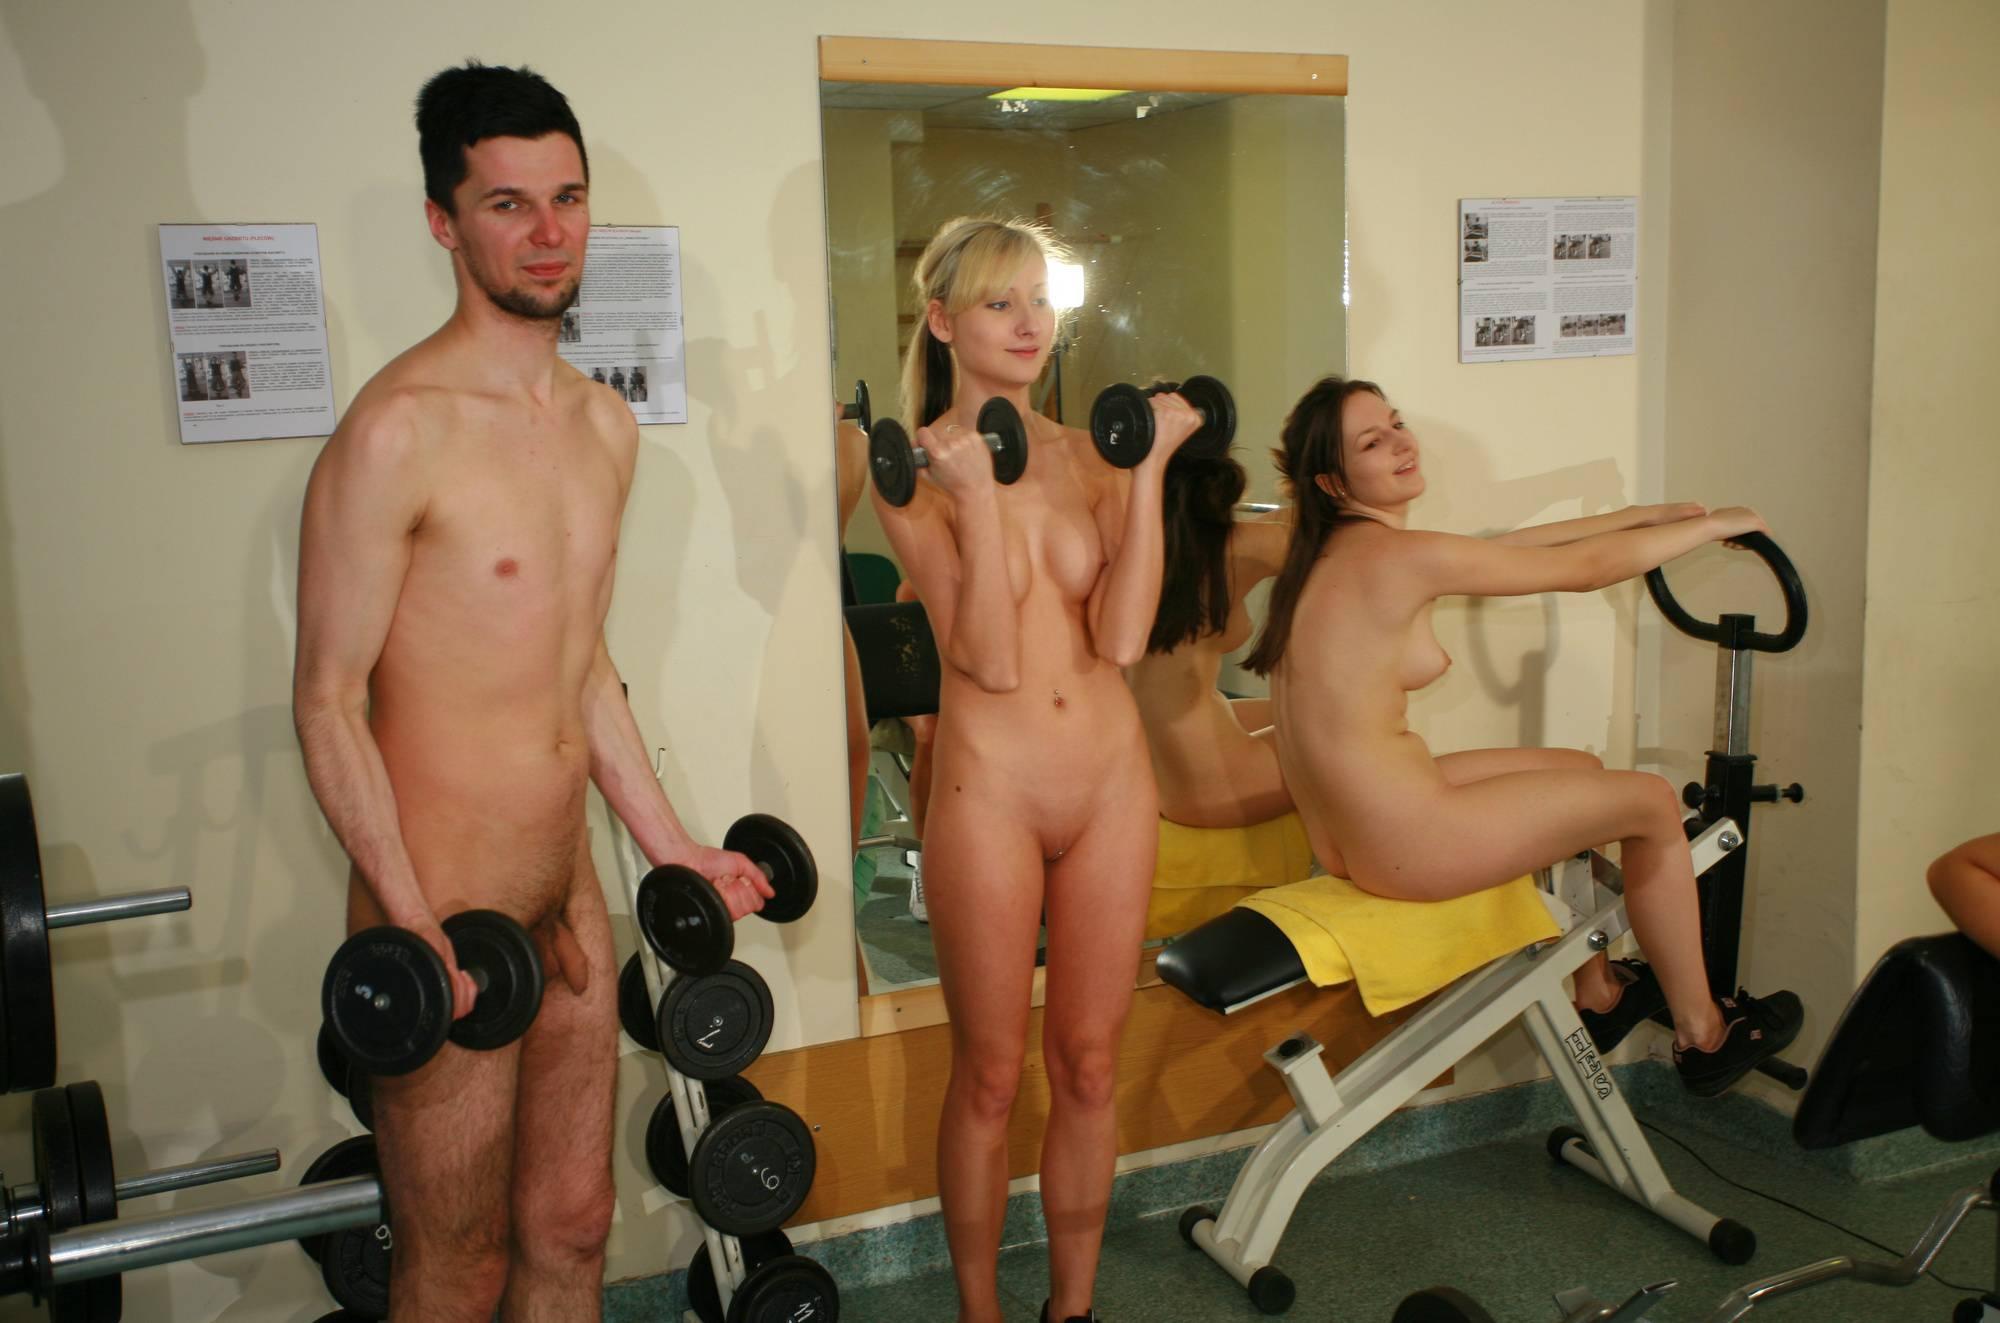 Nudist Photos Scuba Gym 3rd Workout - 1